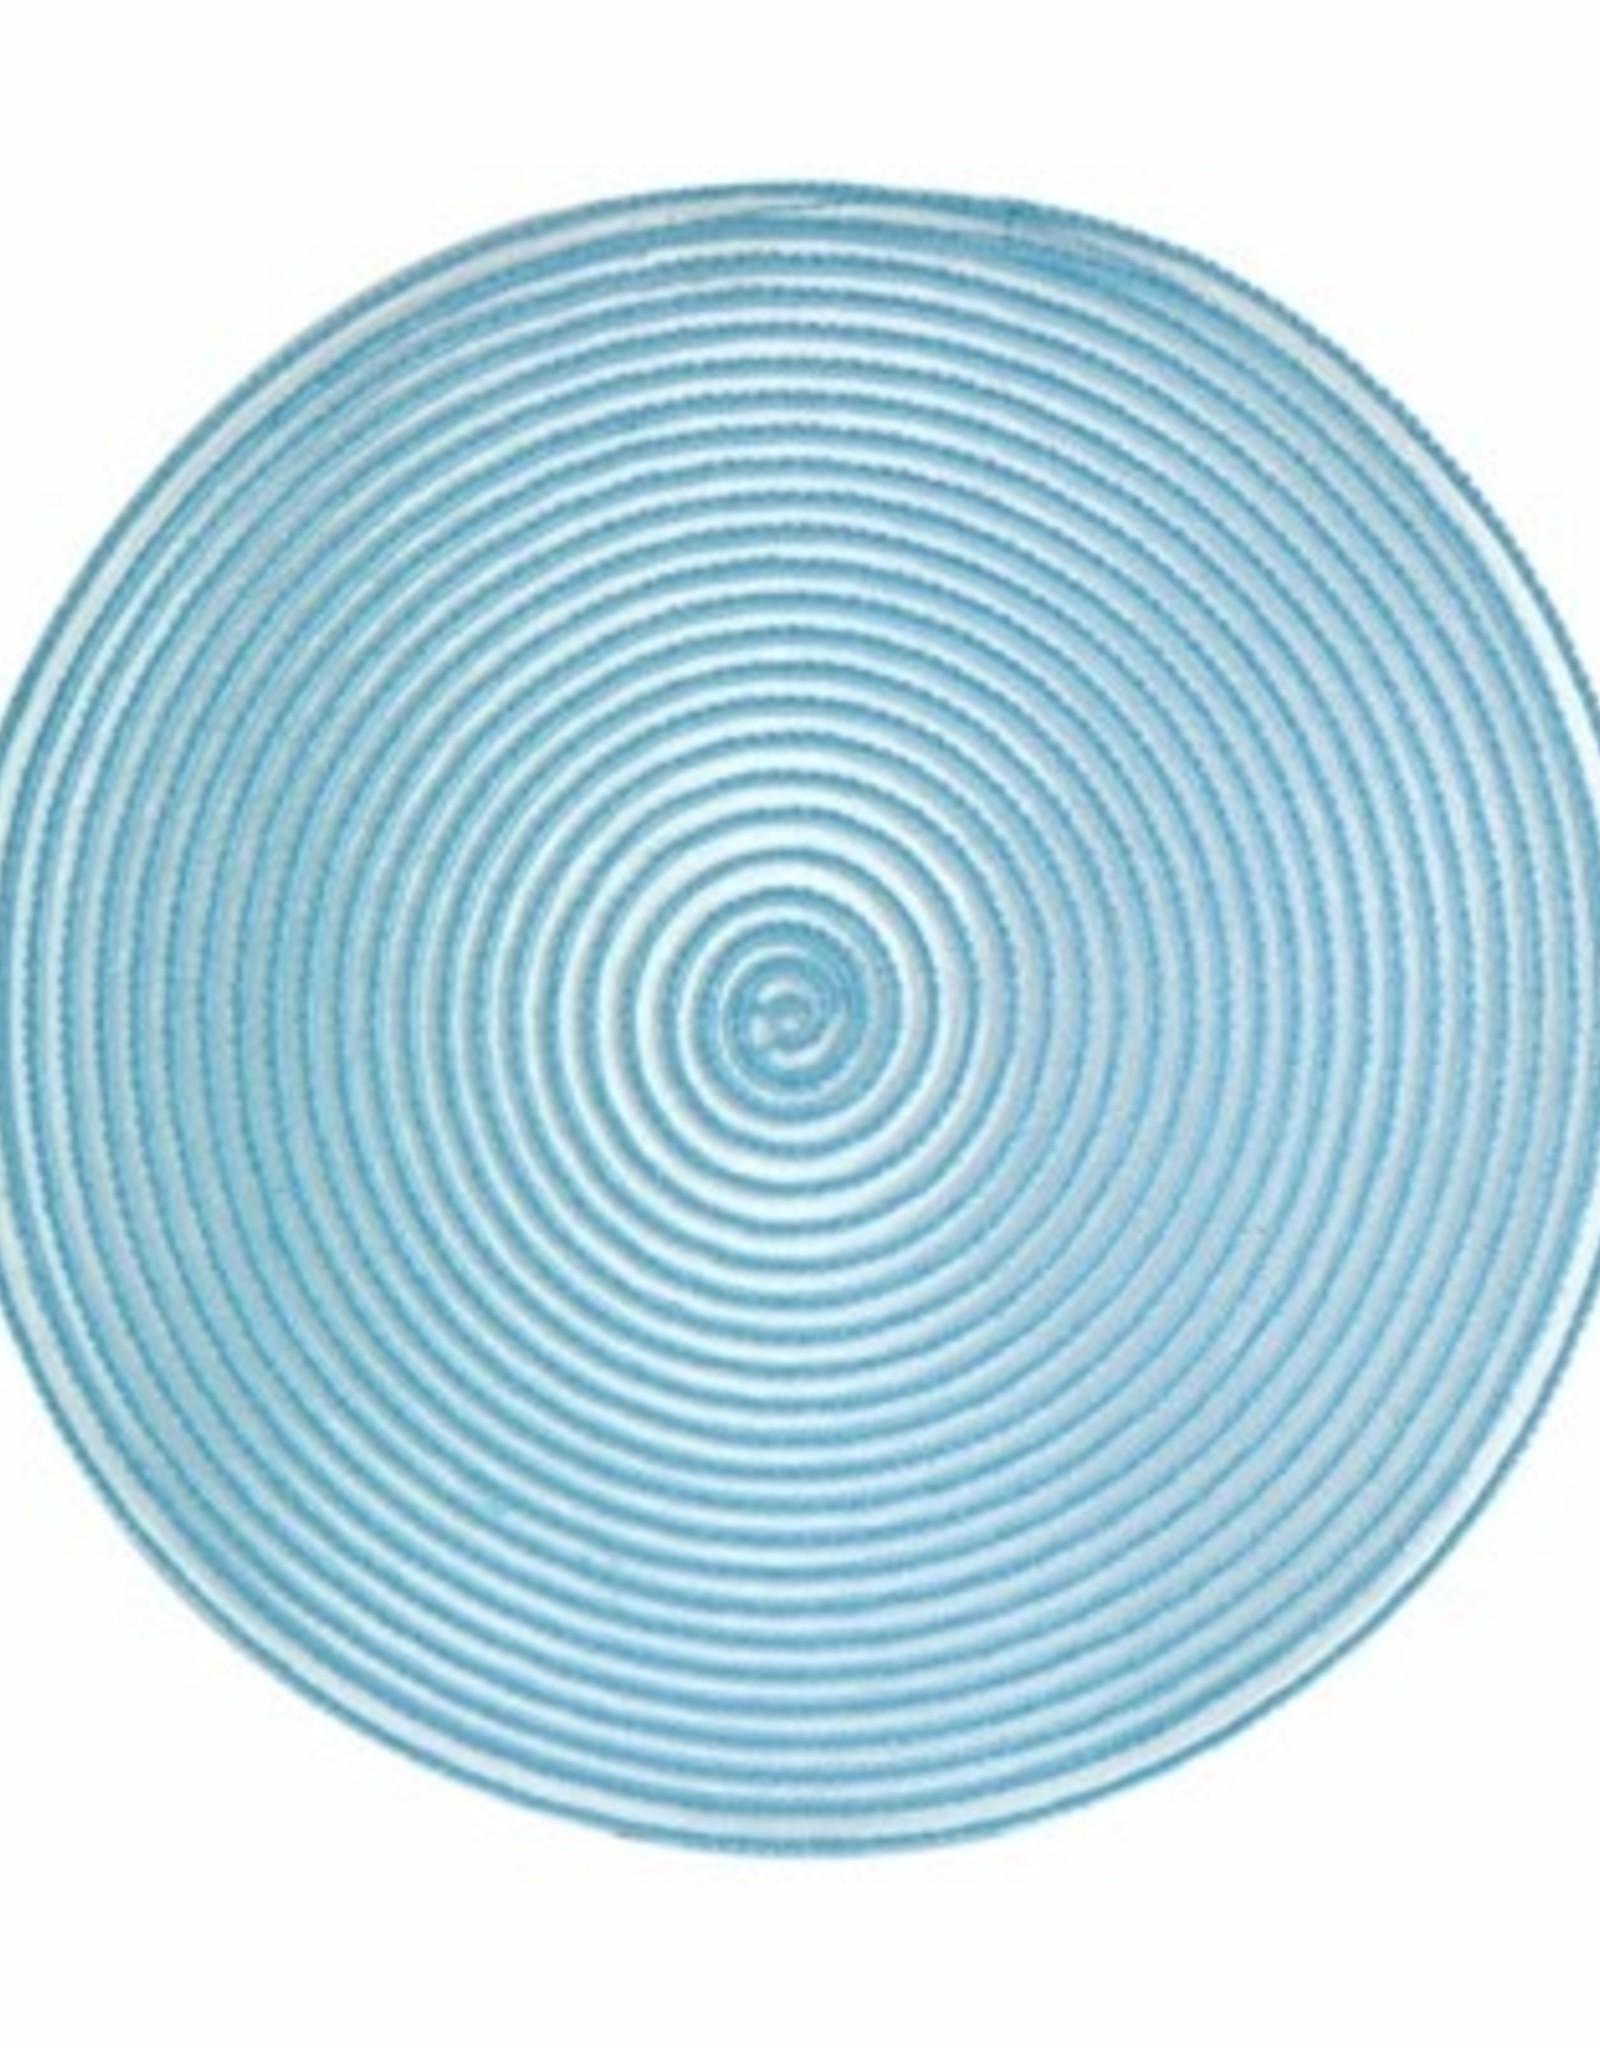 Placemat Harman Sheer Round Aqua